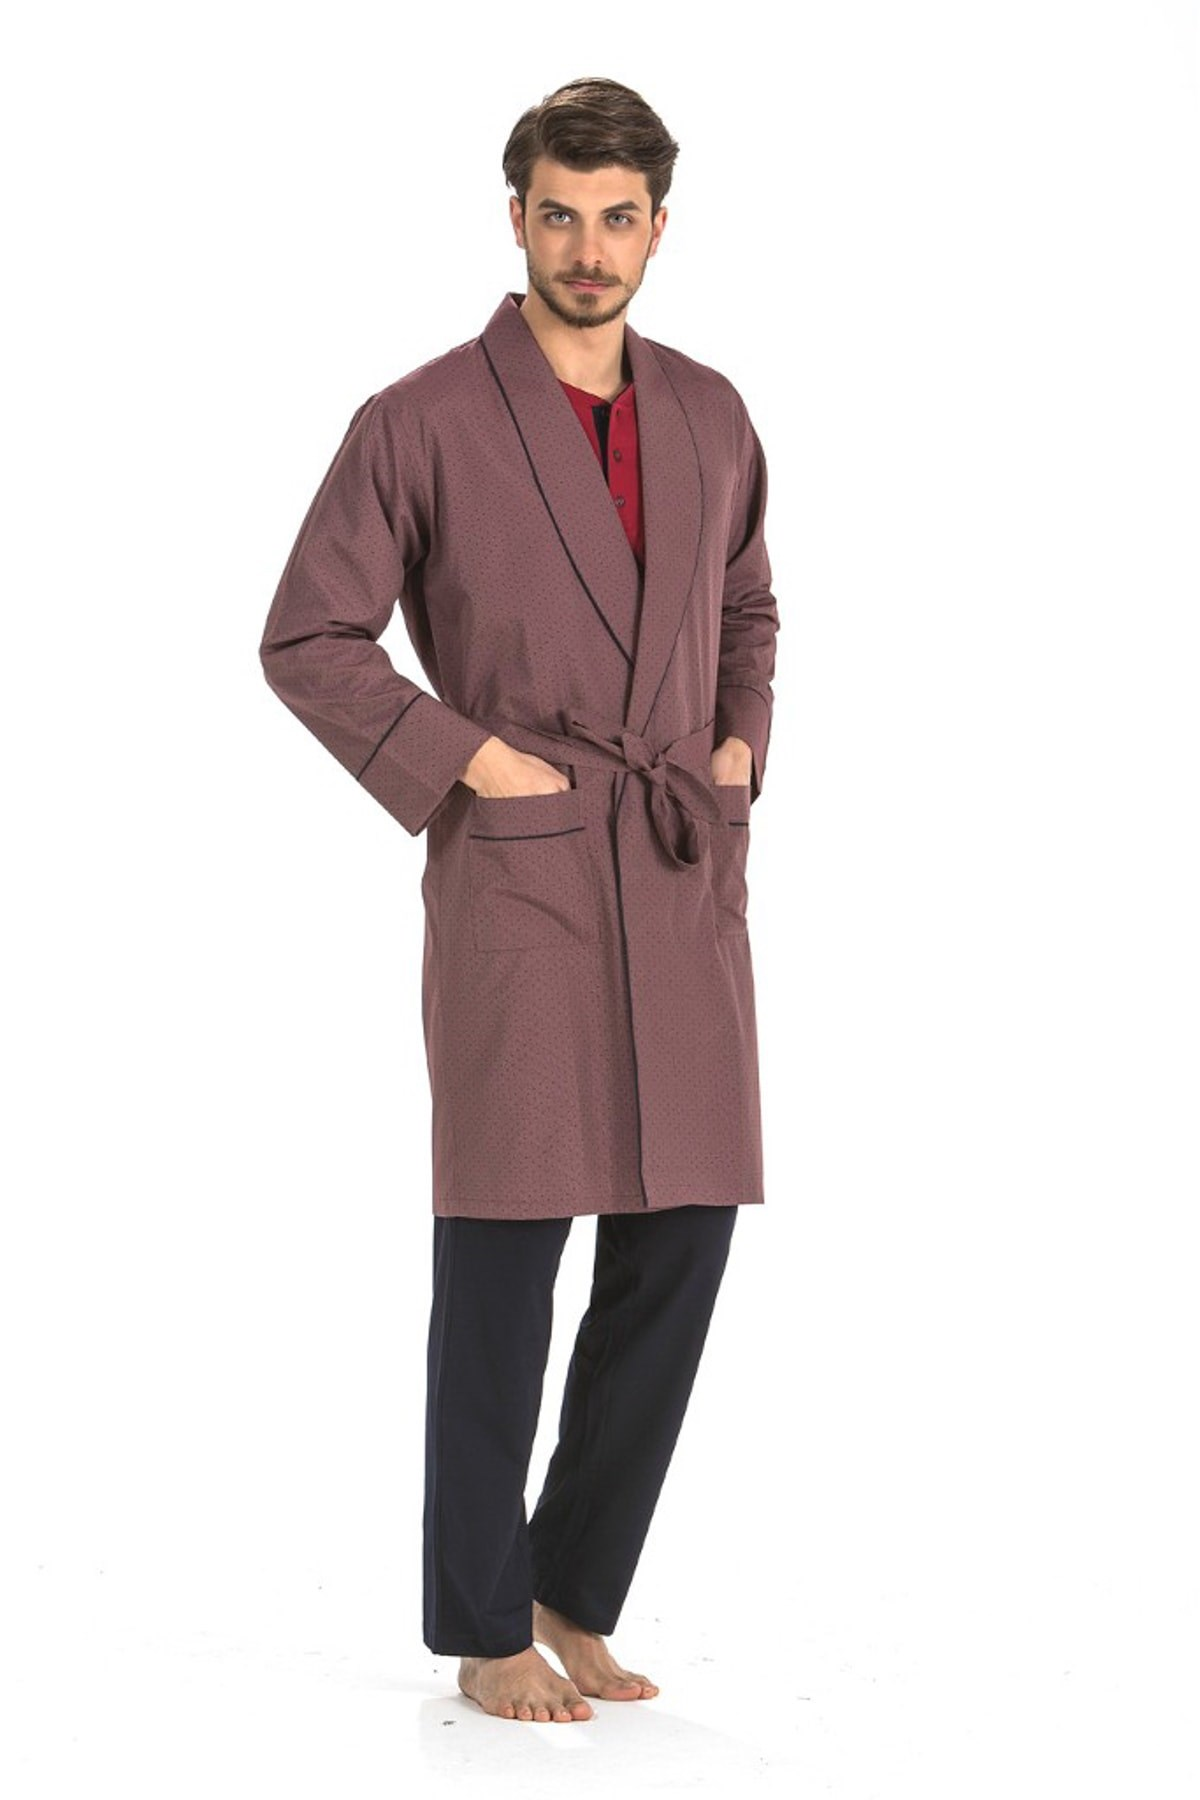 Pierre Cardin 5 Li Long & Şortlu Sleepwear Robdöşambır Set